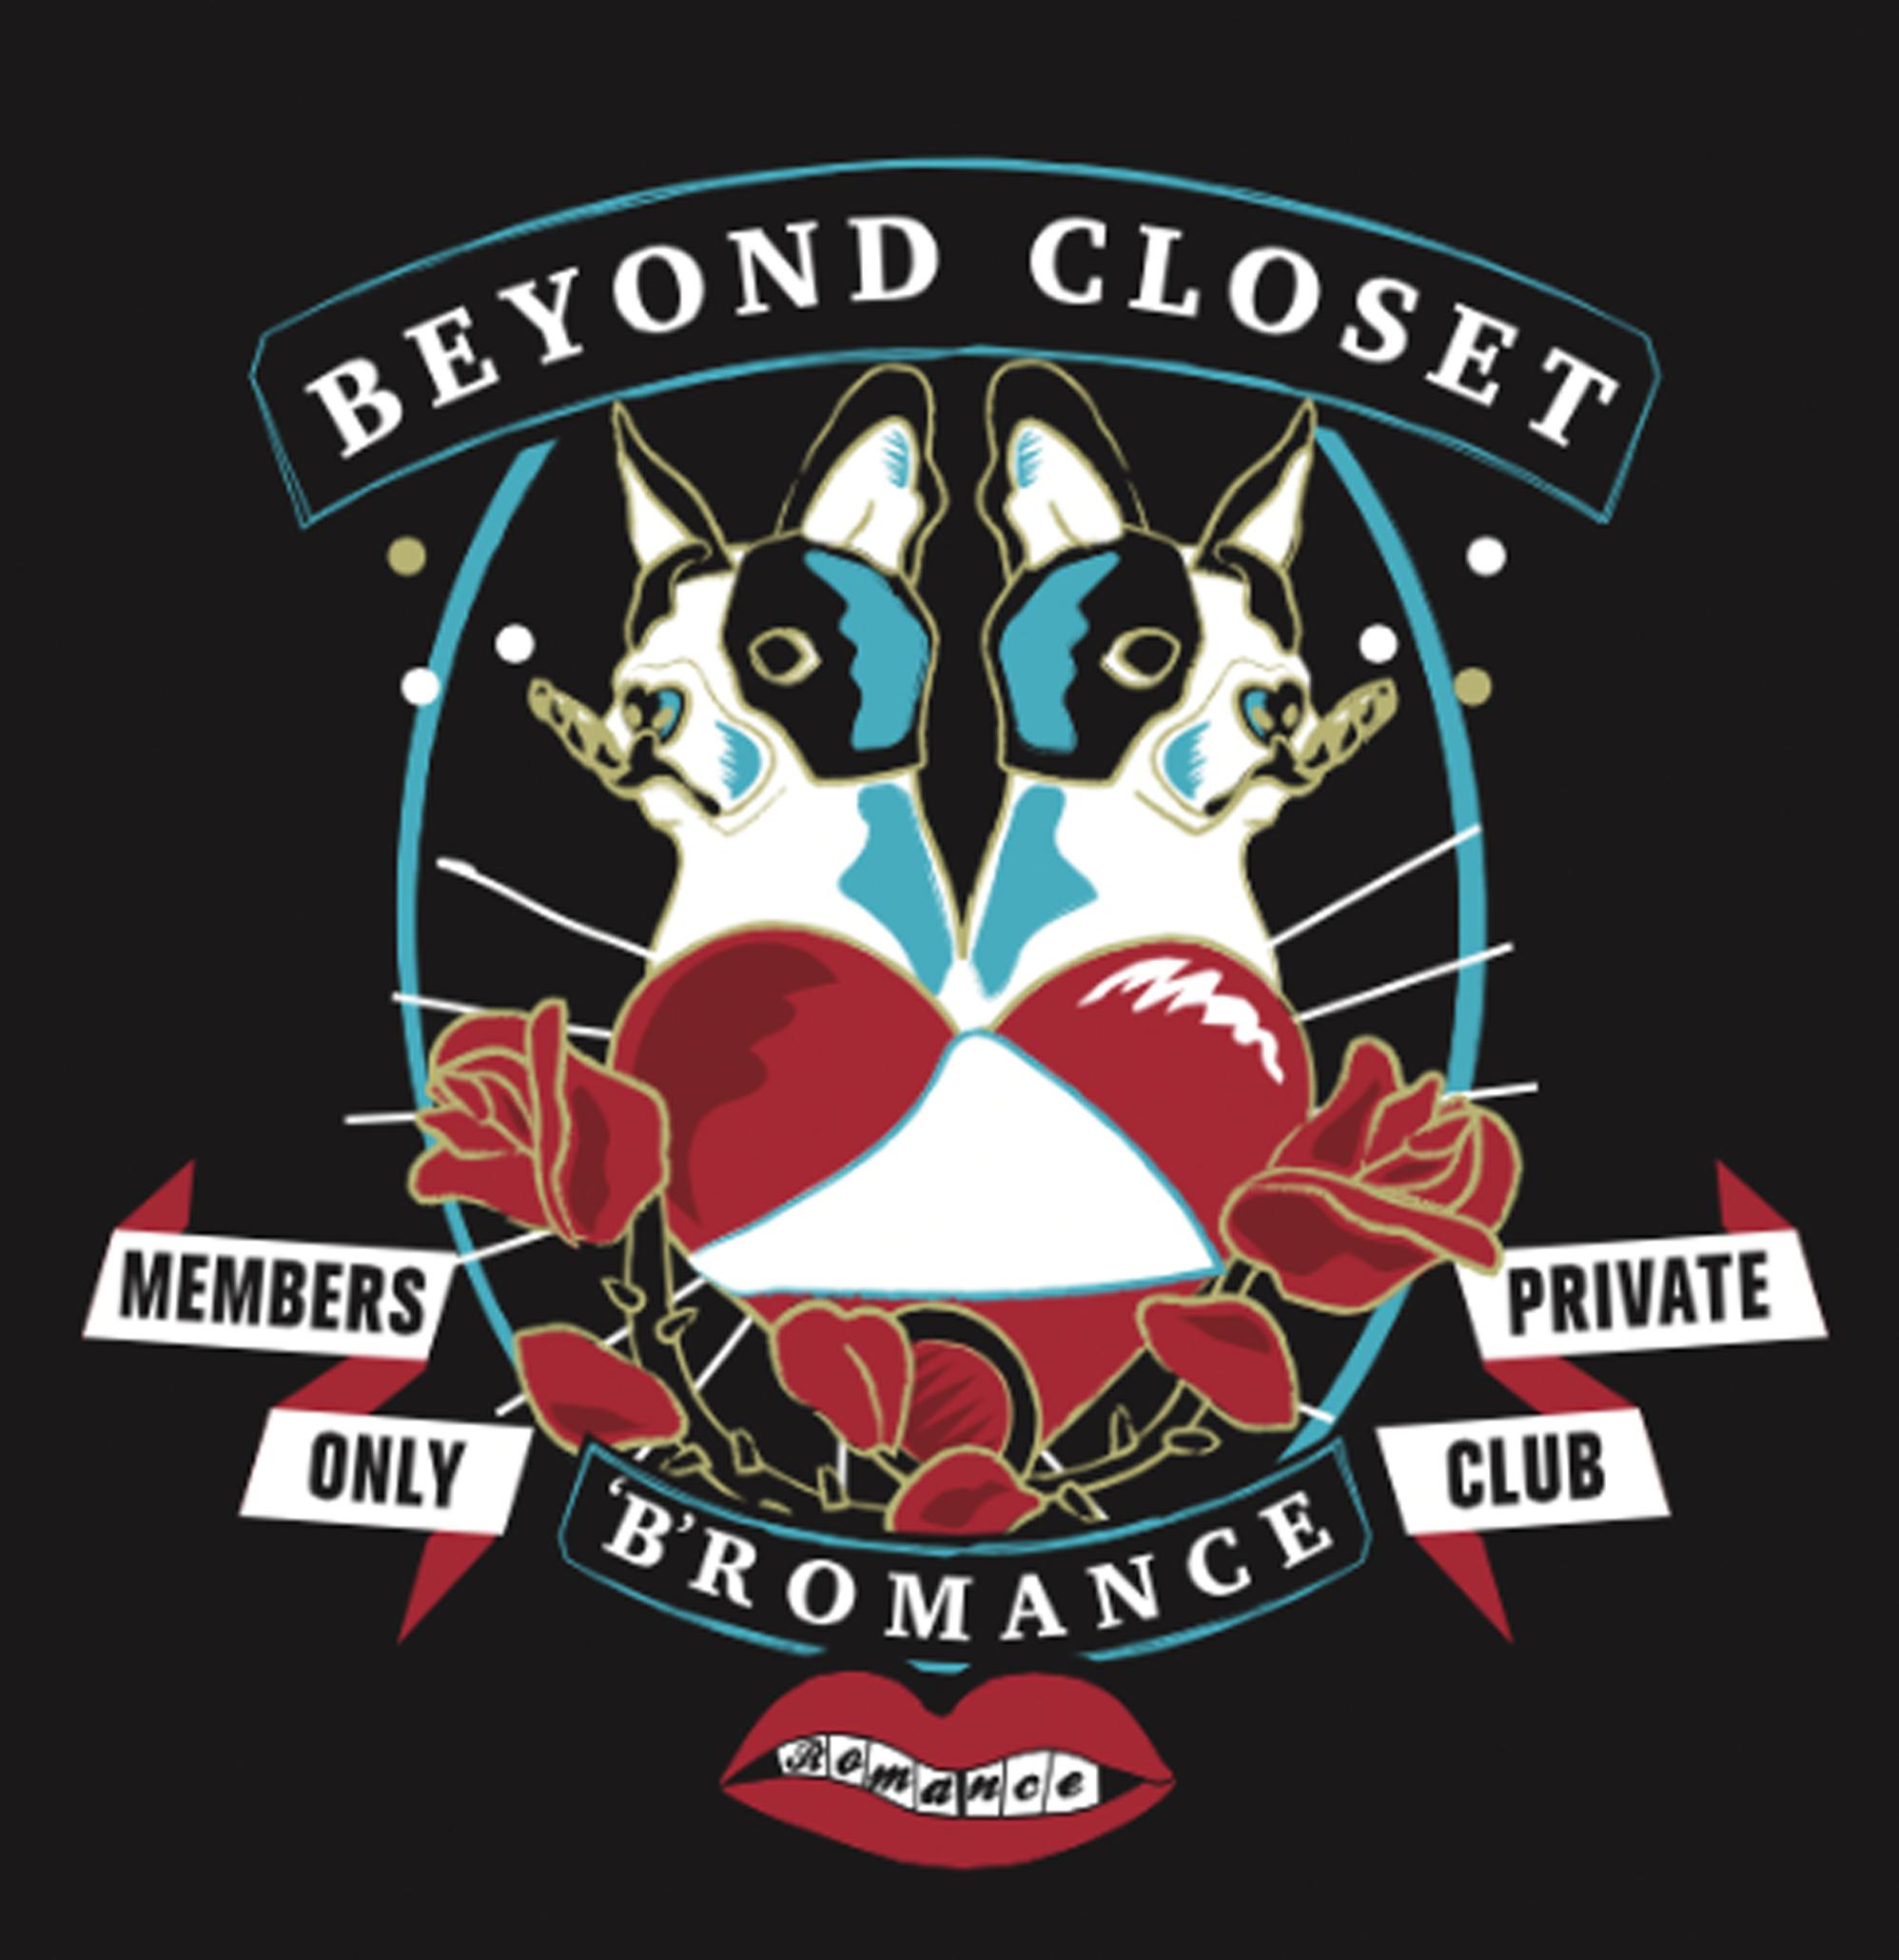 Beyond Closet